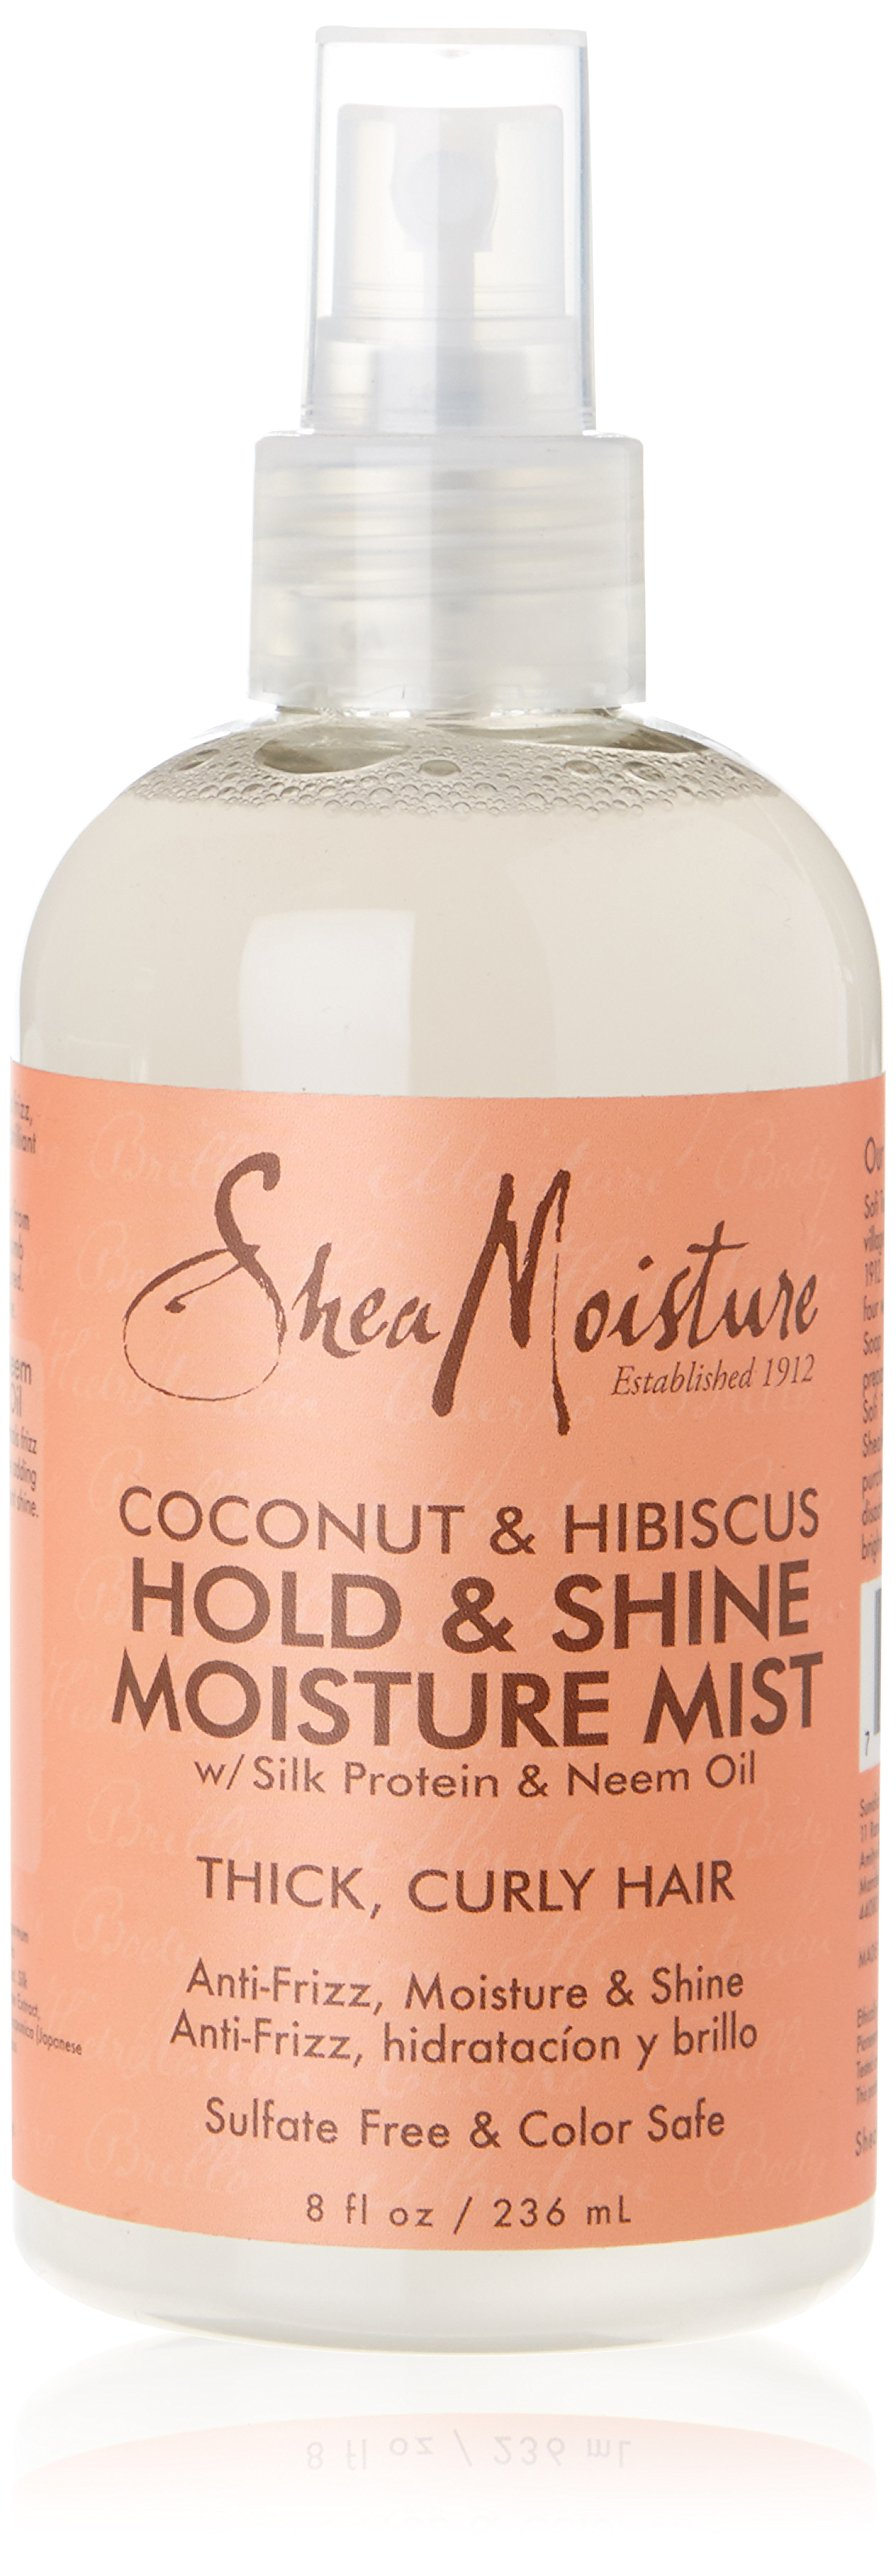 Shea Moisture Coconut Hibiscus Hold & Shine Daily Moisture Mist, 8 Ounce